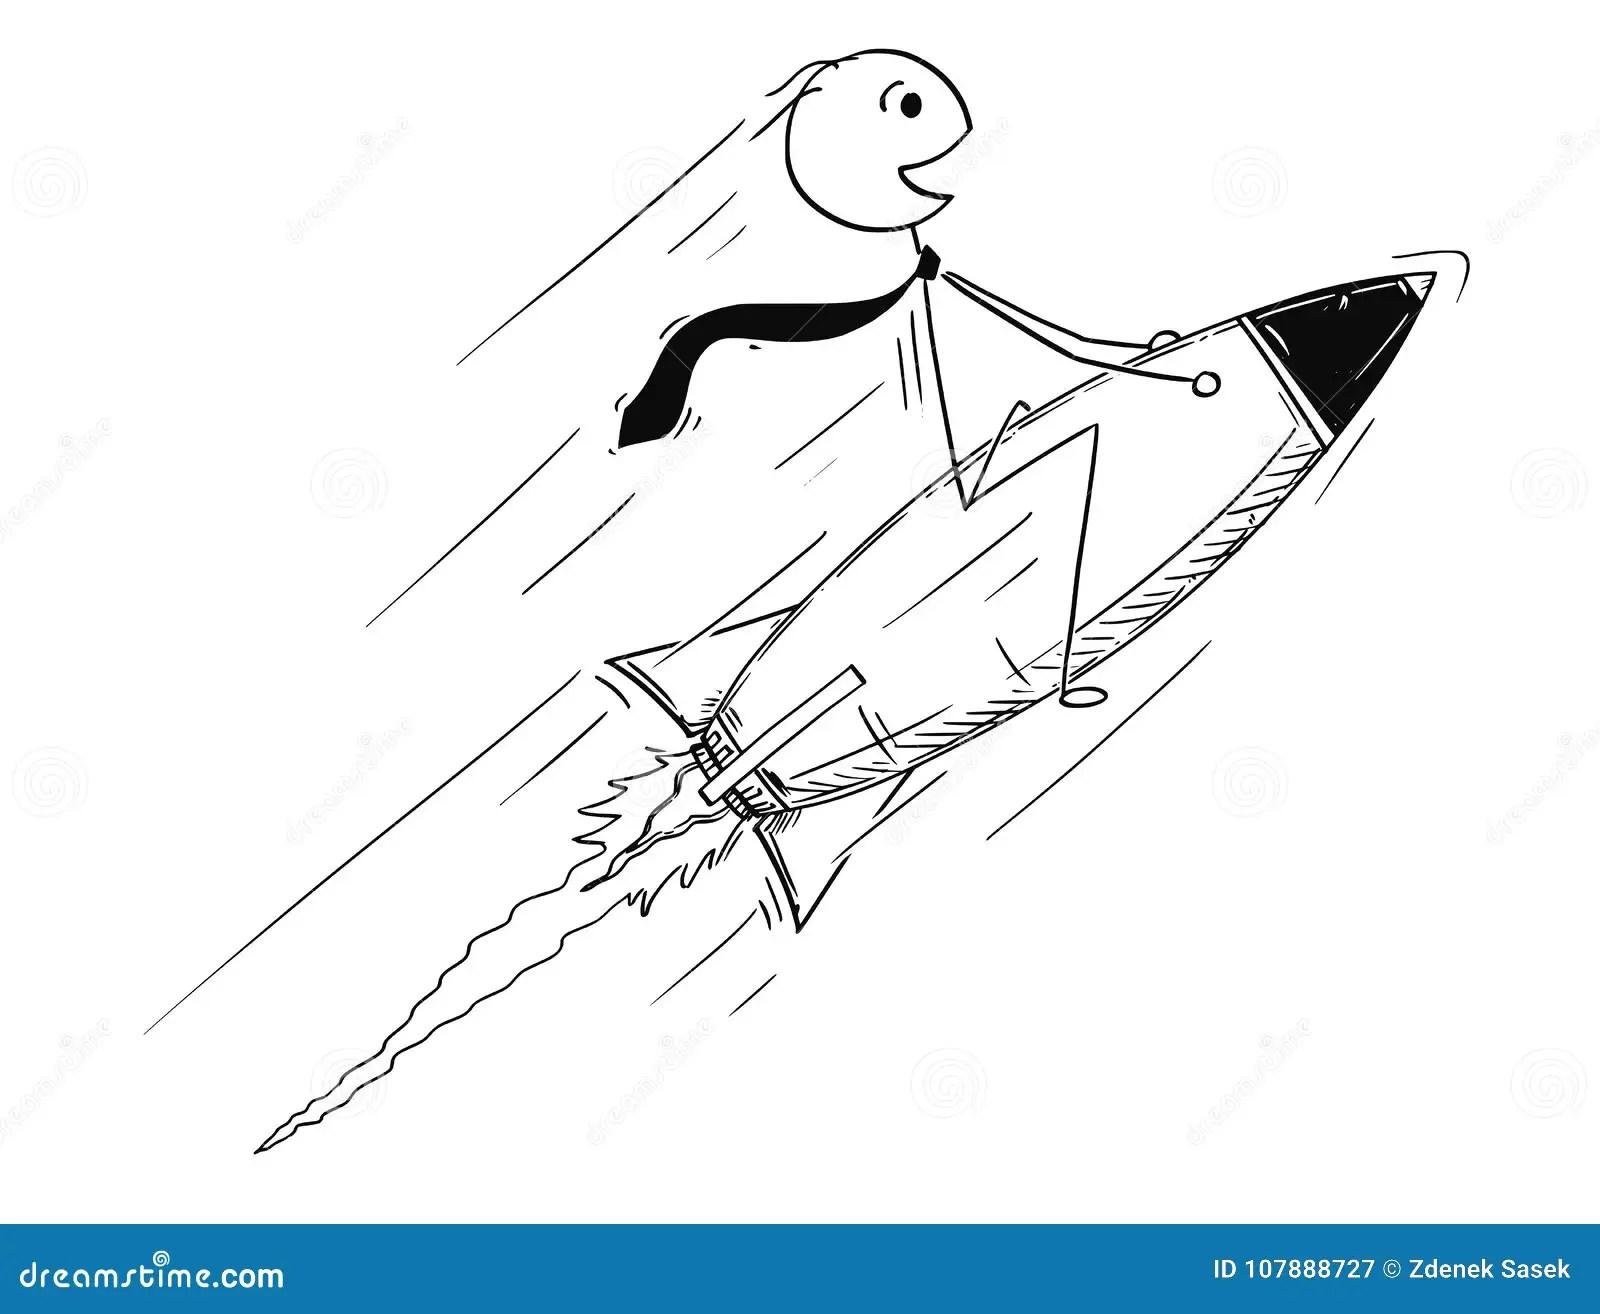 Conceptual Cartoon Of Business Success Stock Vector